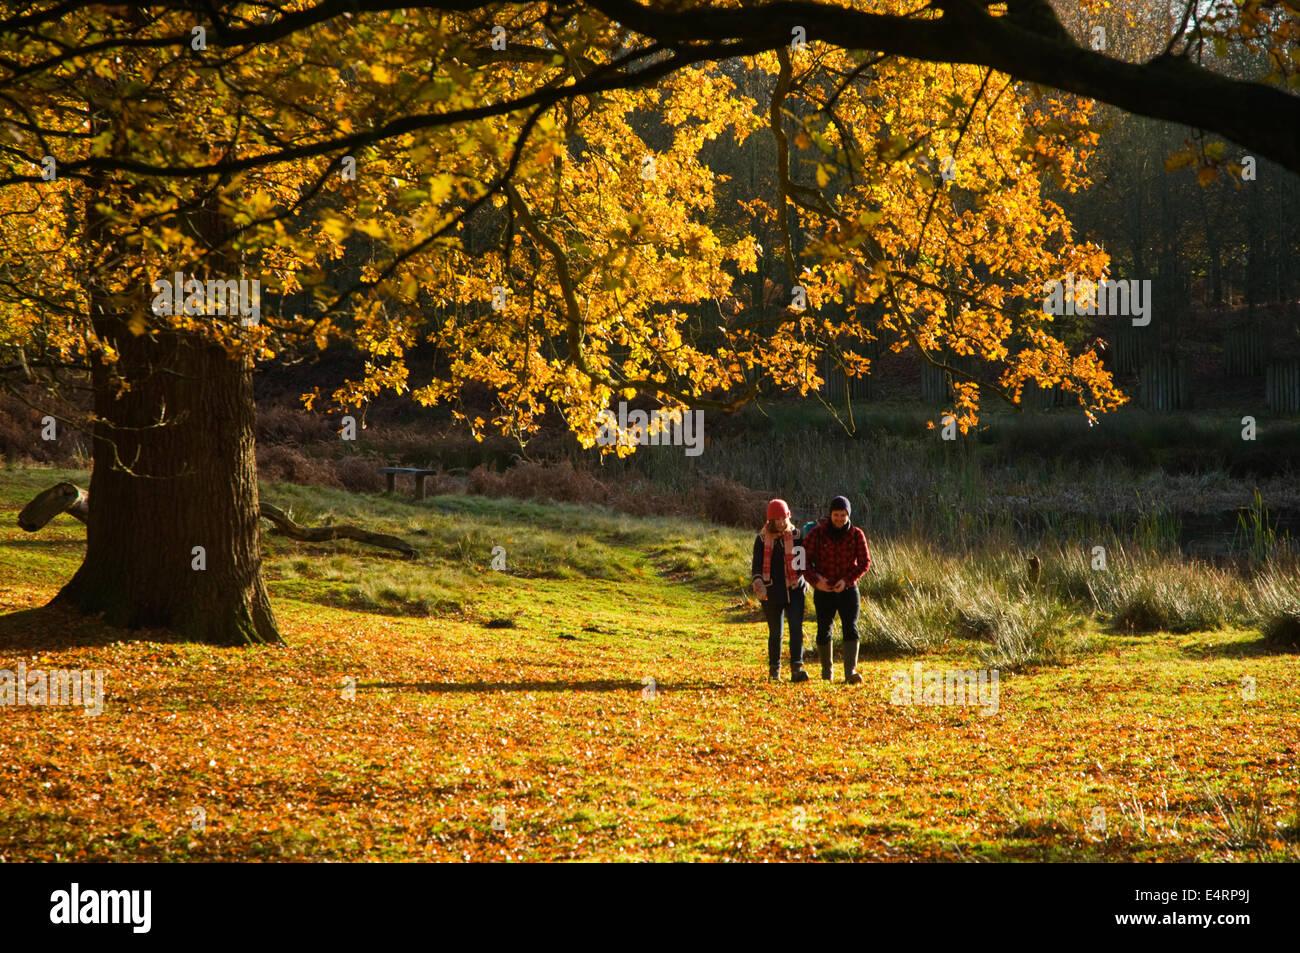 UK, Cheshire, Dunham Massey Park, autumn foliage and walkers in warm sunlight - Stock Image